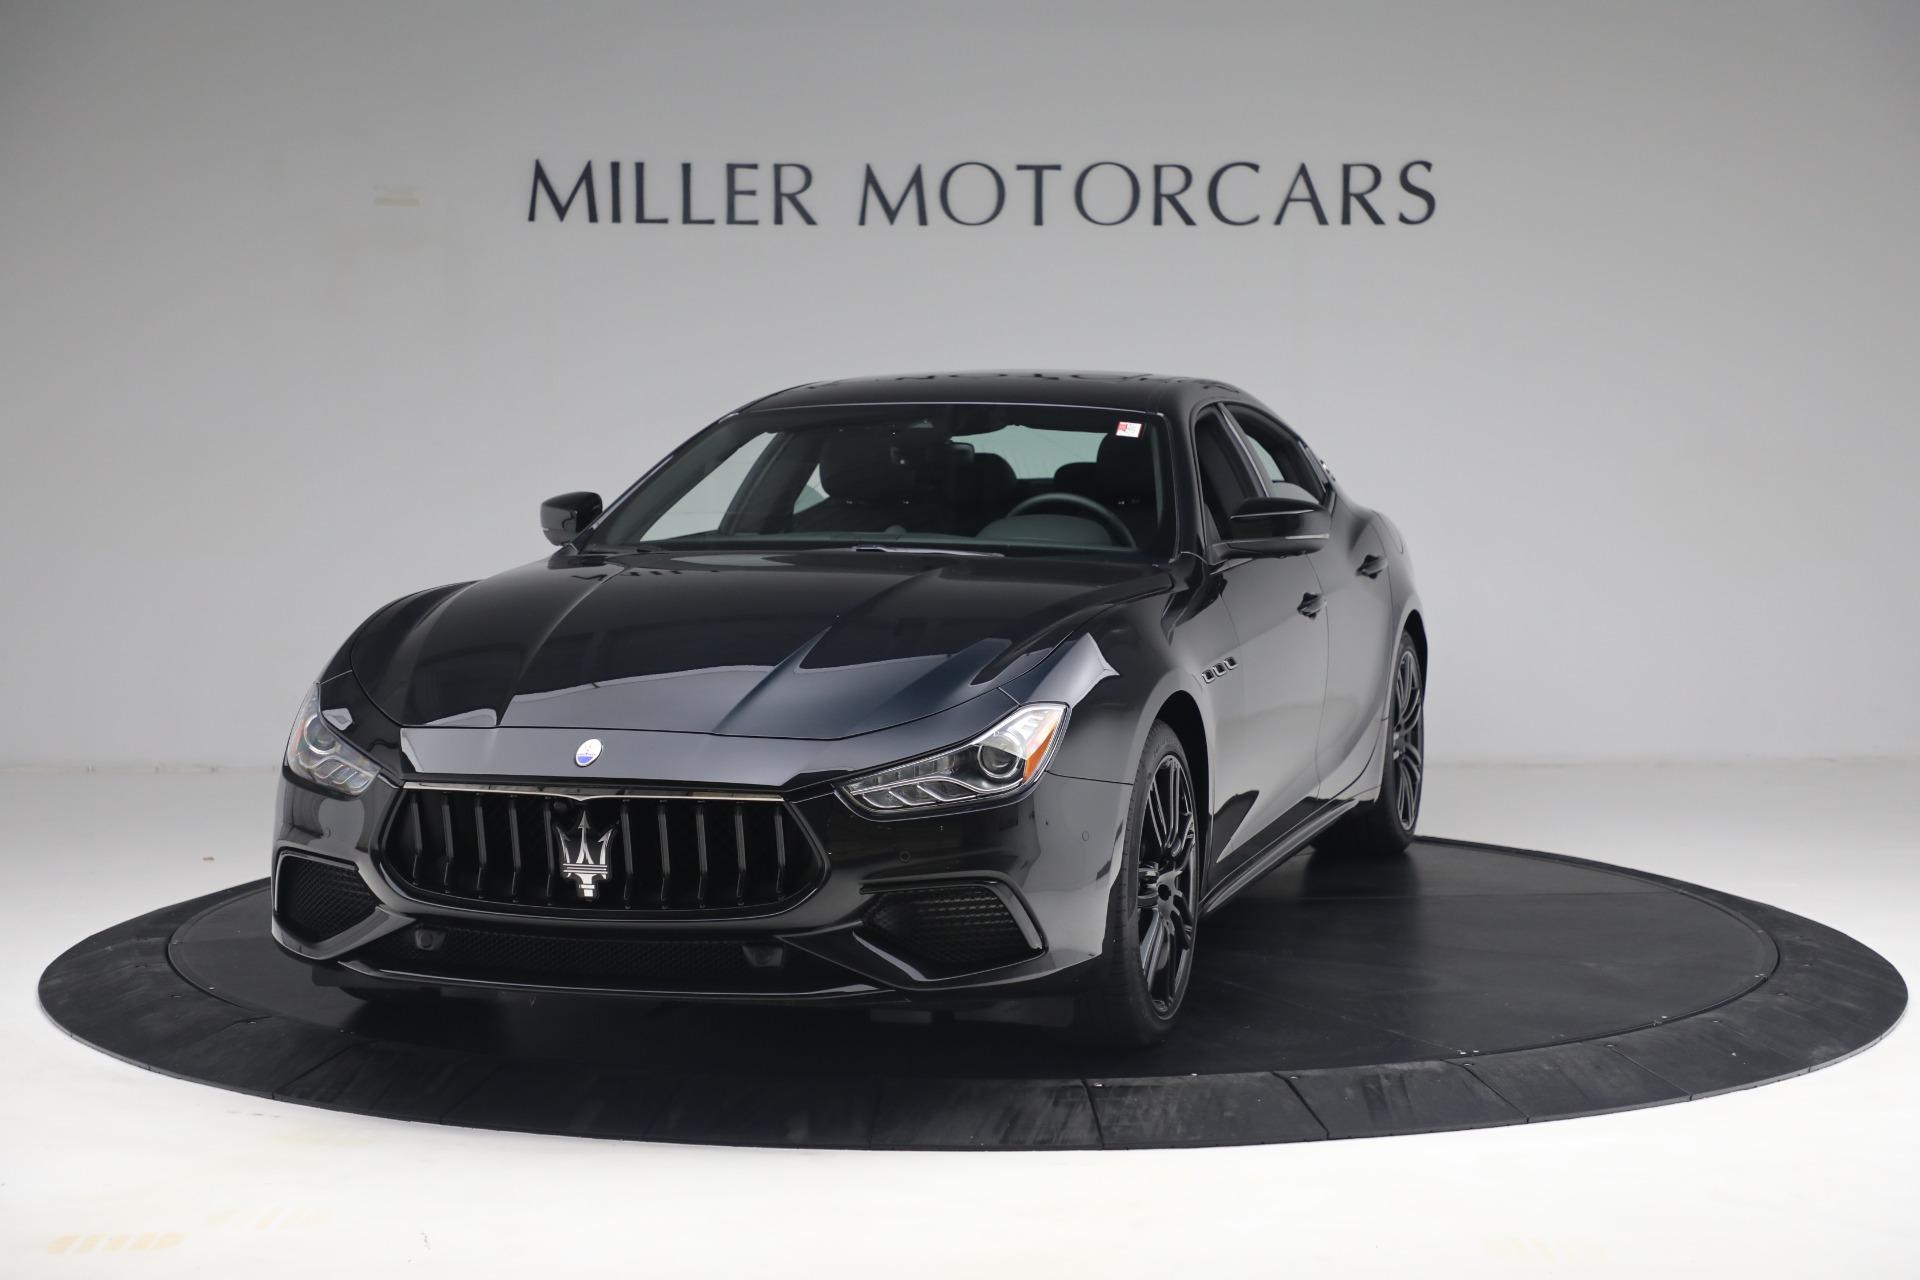 New 2021 Maserati Ghibli SQ4 for sale $92,894 at Pagani of Greenwich in Greenwich CT 06830 1